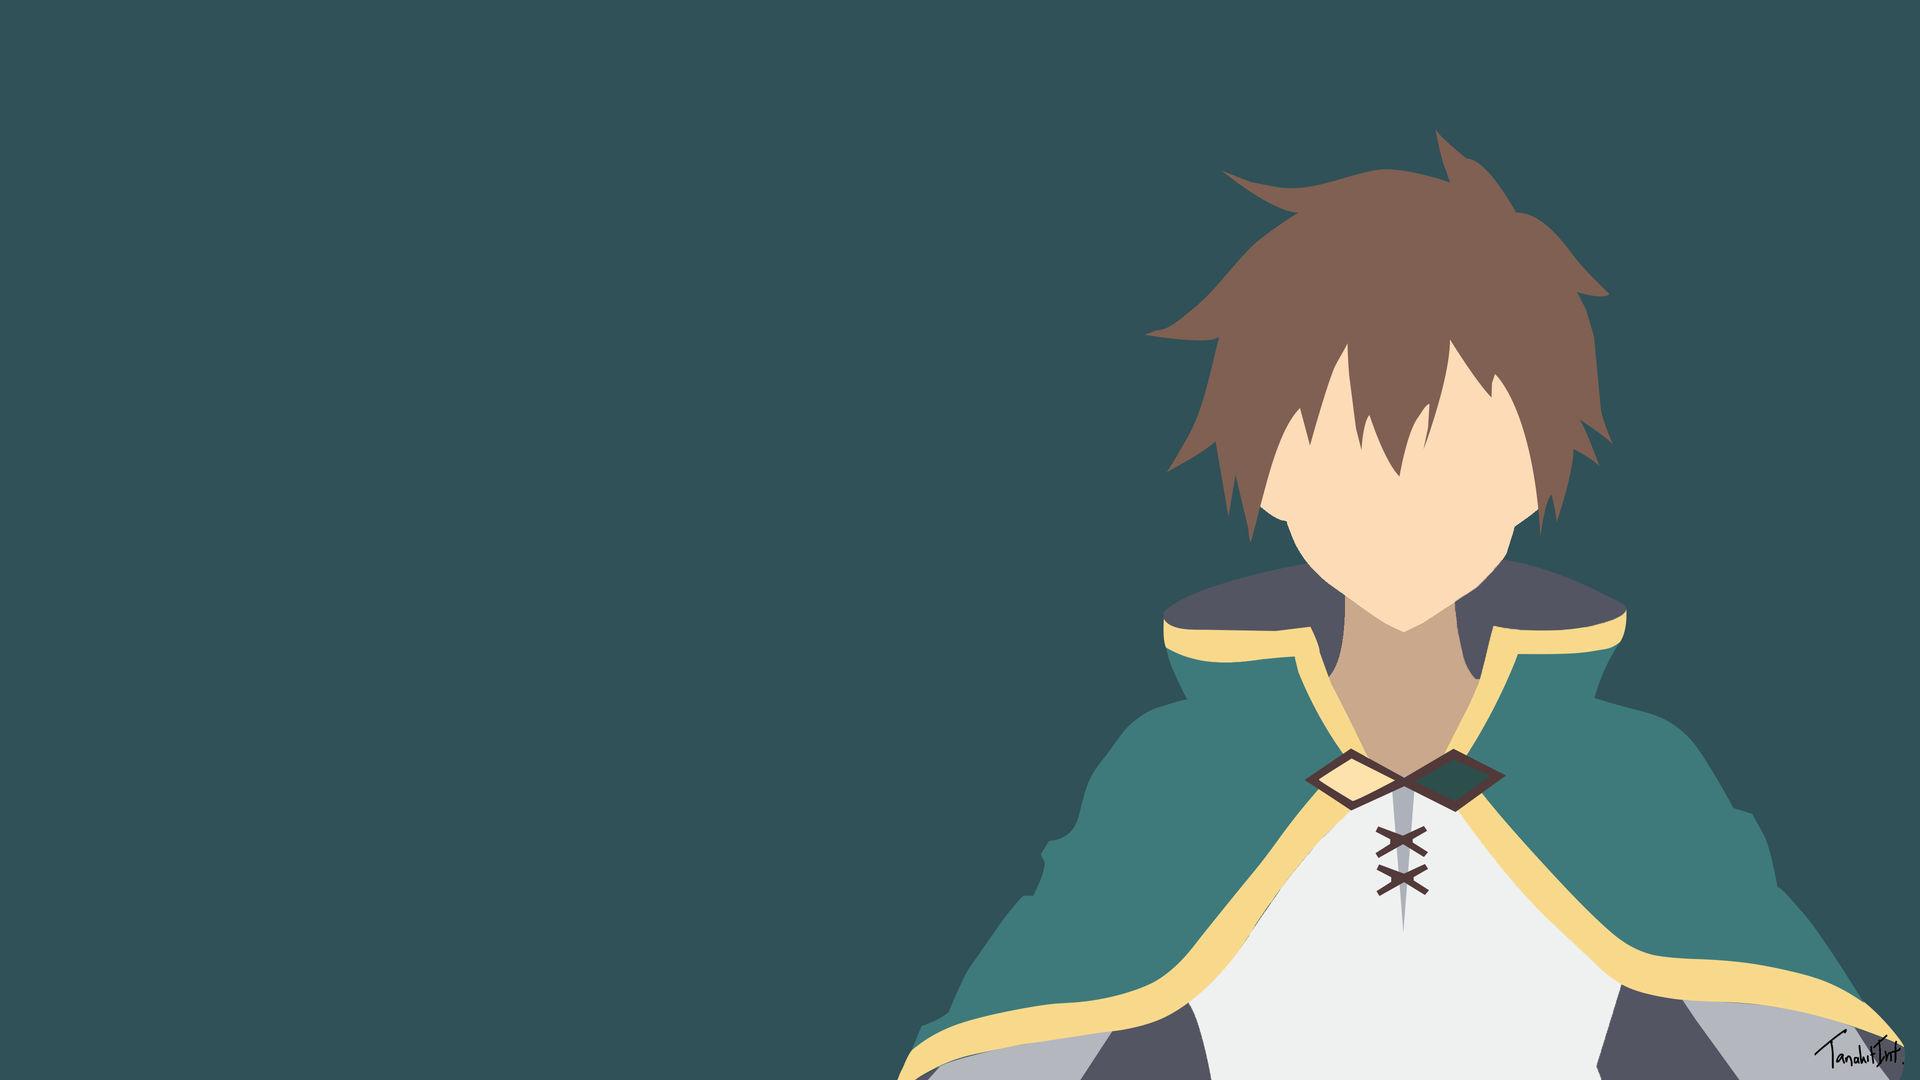 Satou Kazuma Konosuba Minimalist Anime Wallpaper By Tanakitint On Deviantart